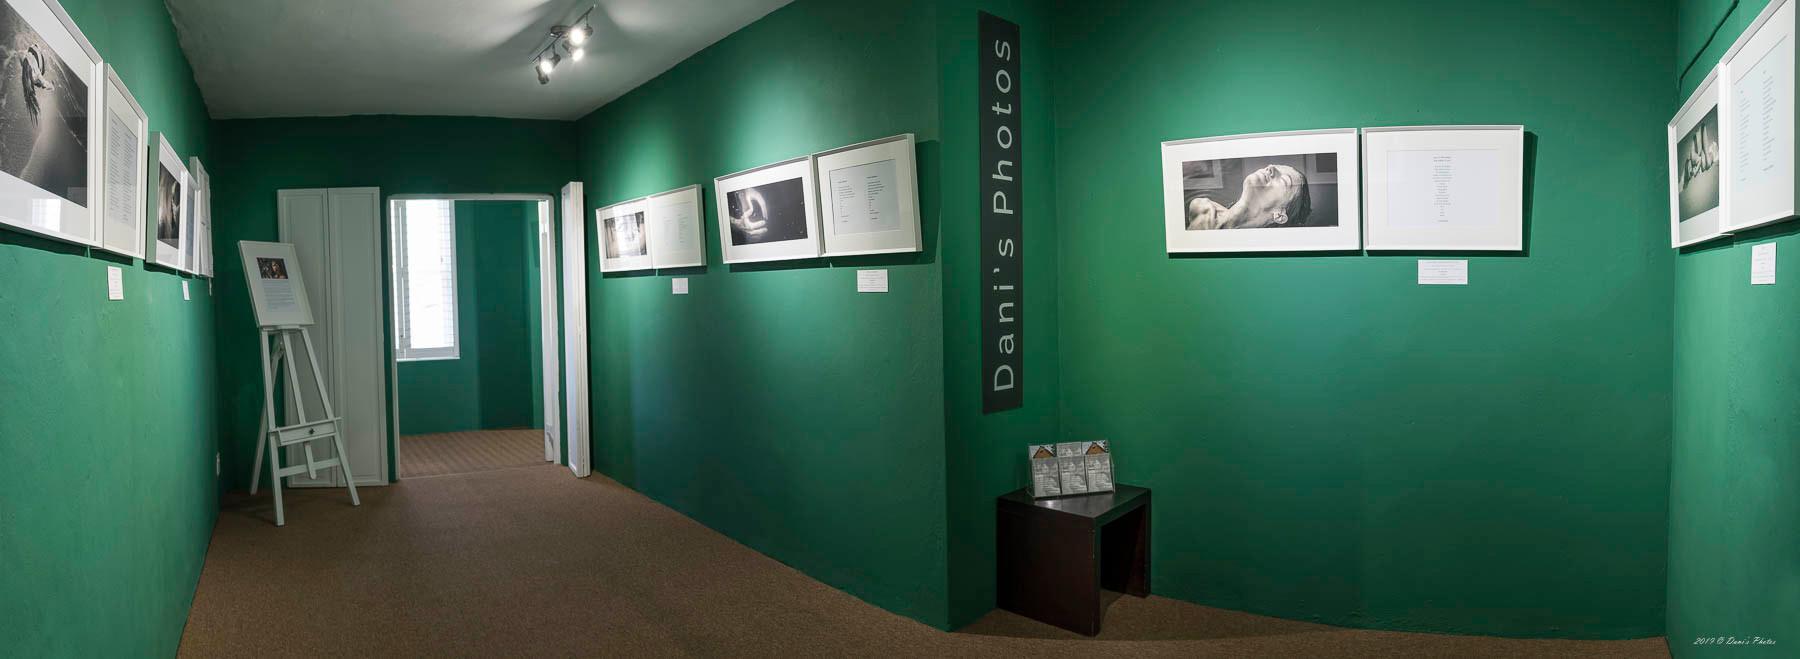 Dani's Photos exhibition